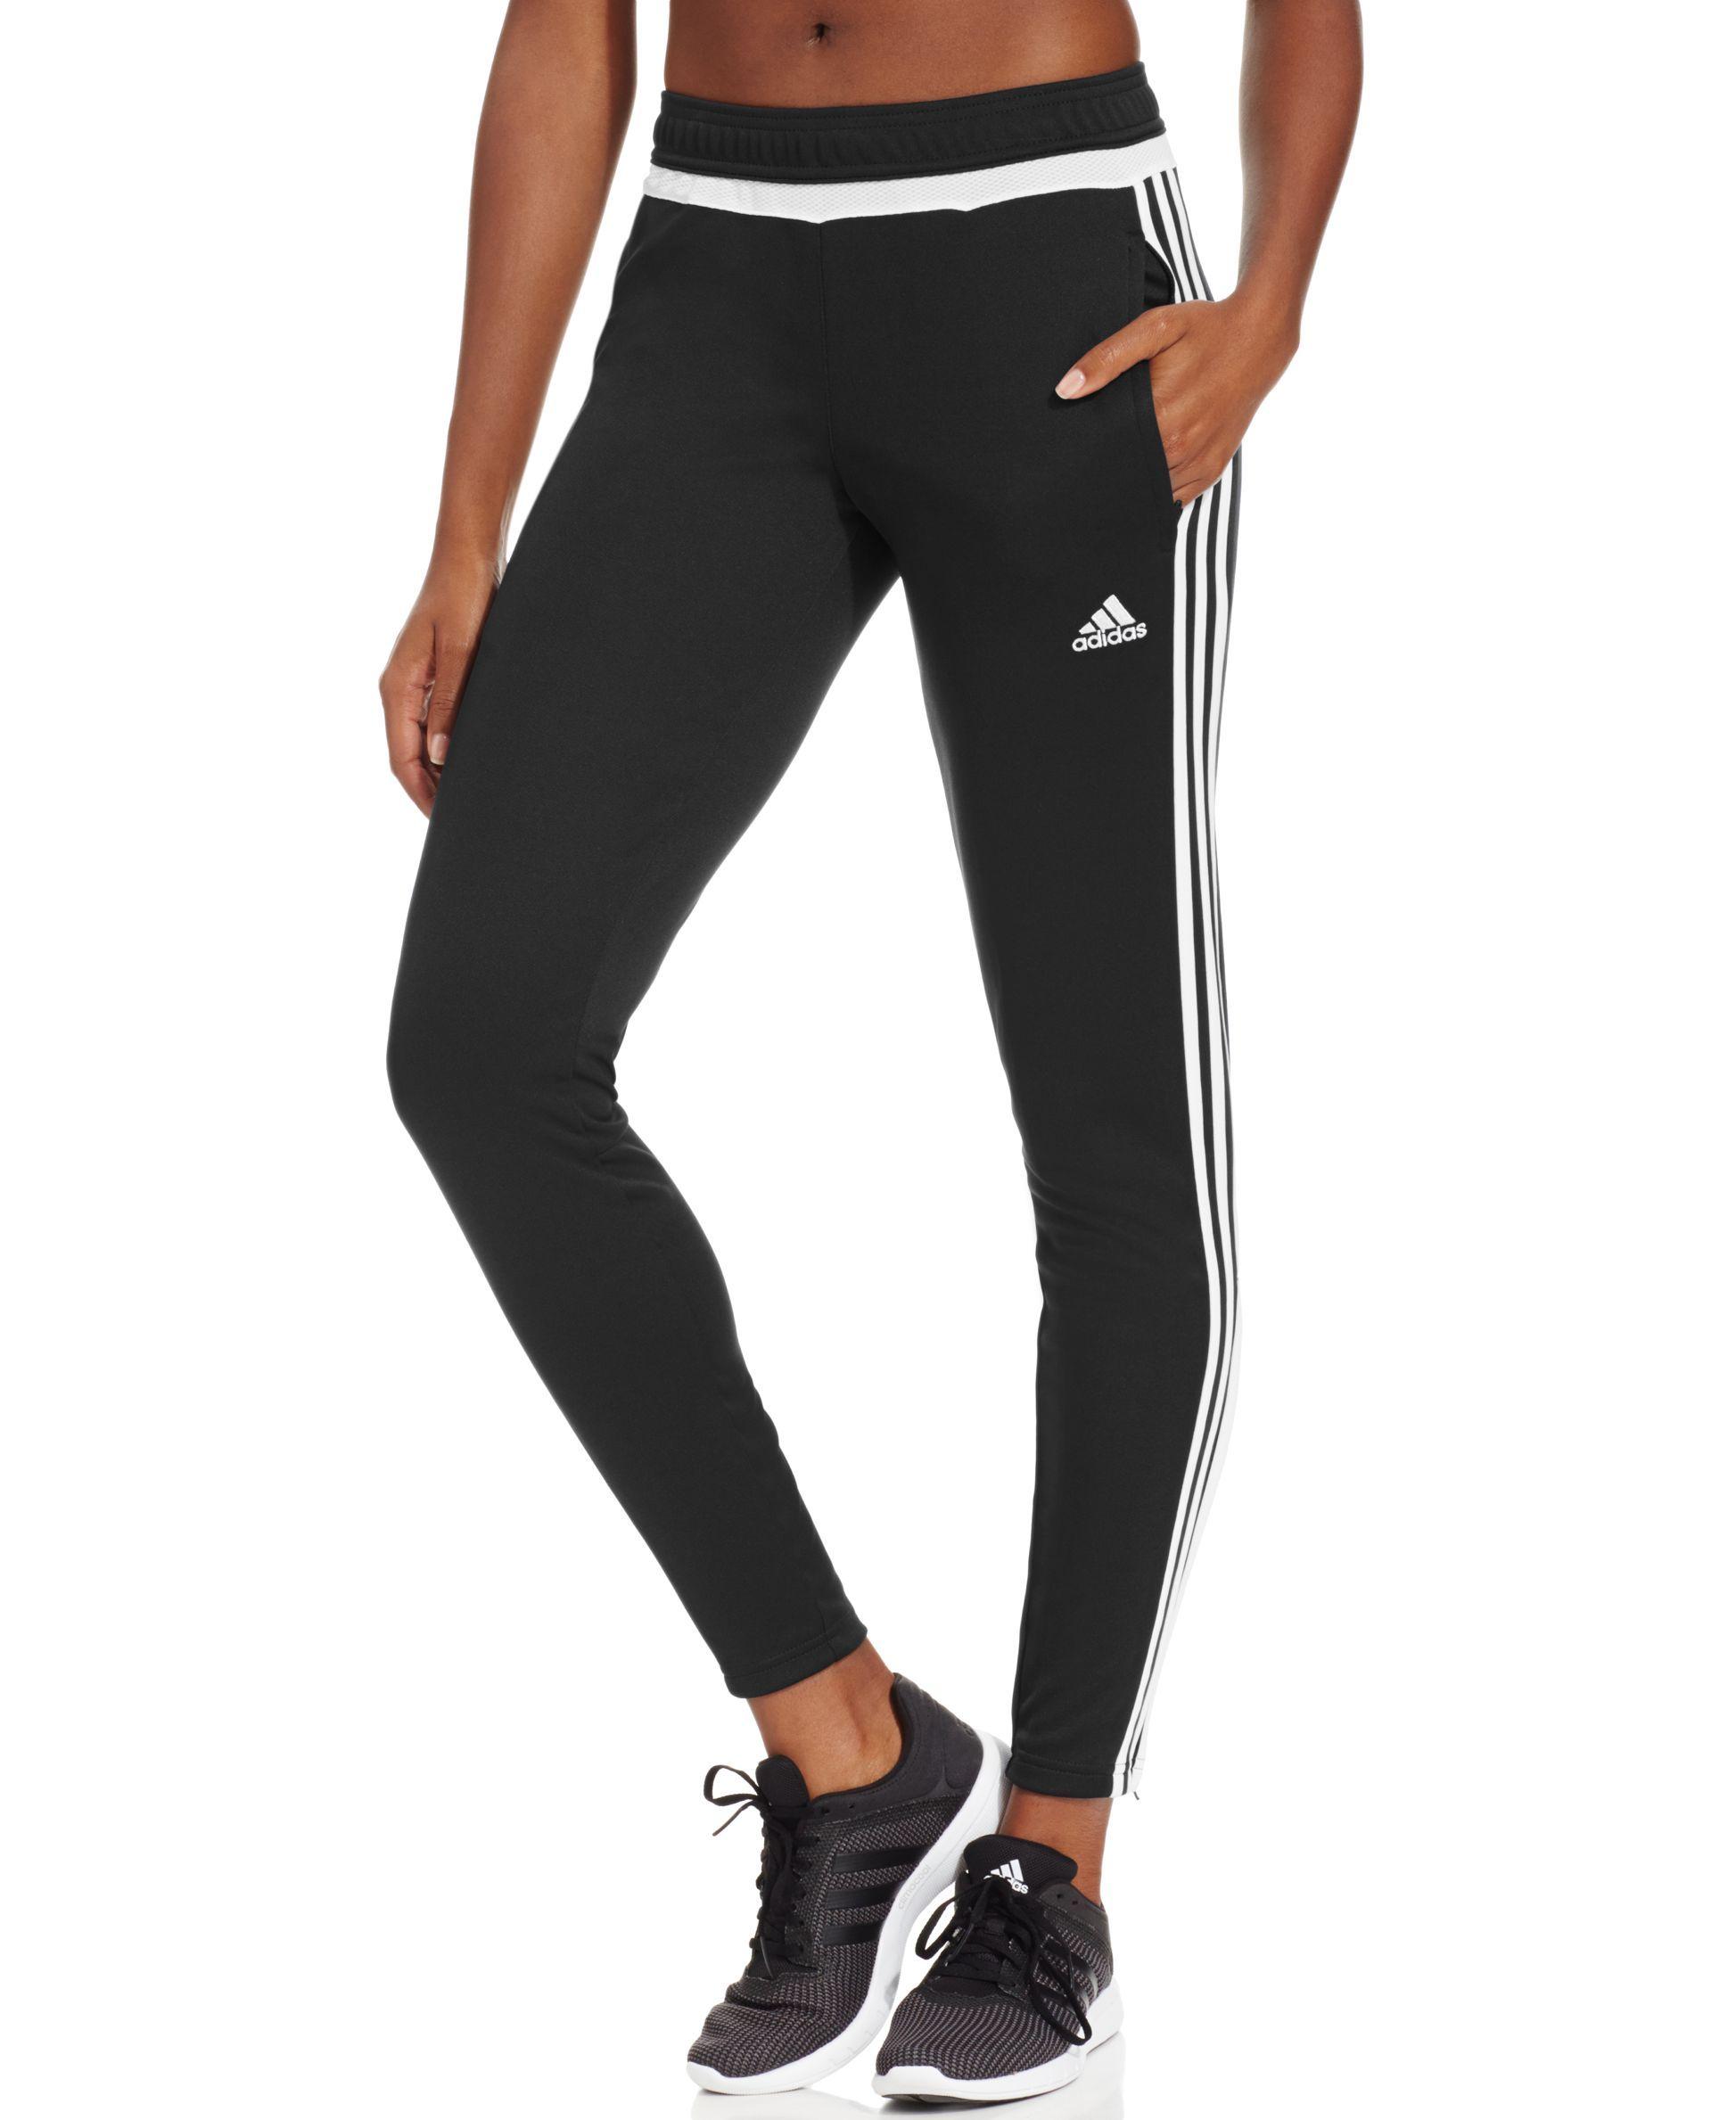 Adidas Tiro 15 ClimaCool? Training Pants - Activewear - Women - Macy\u0027s